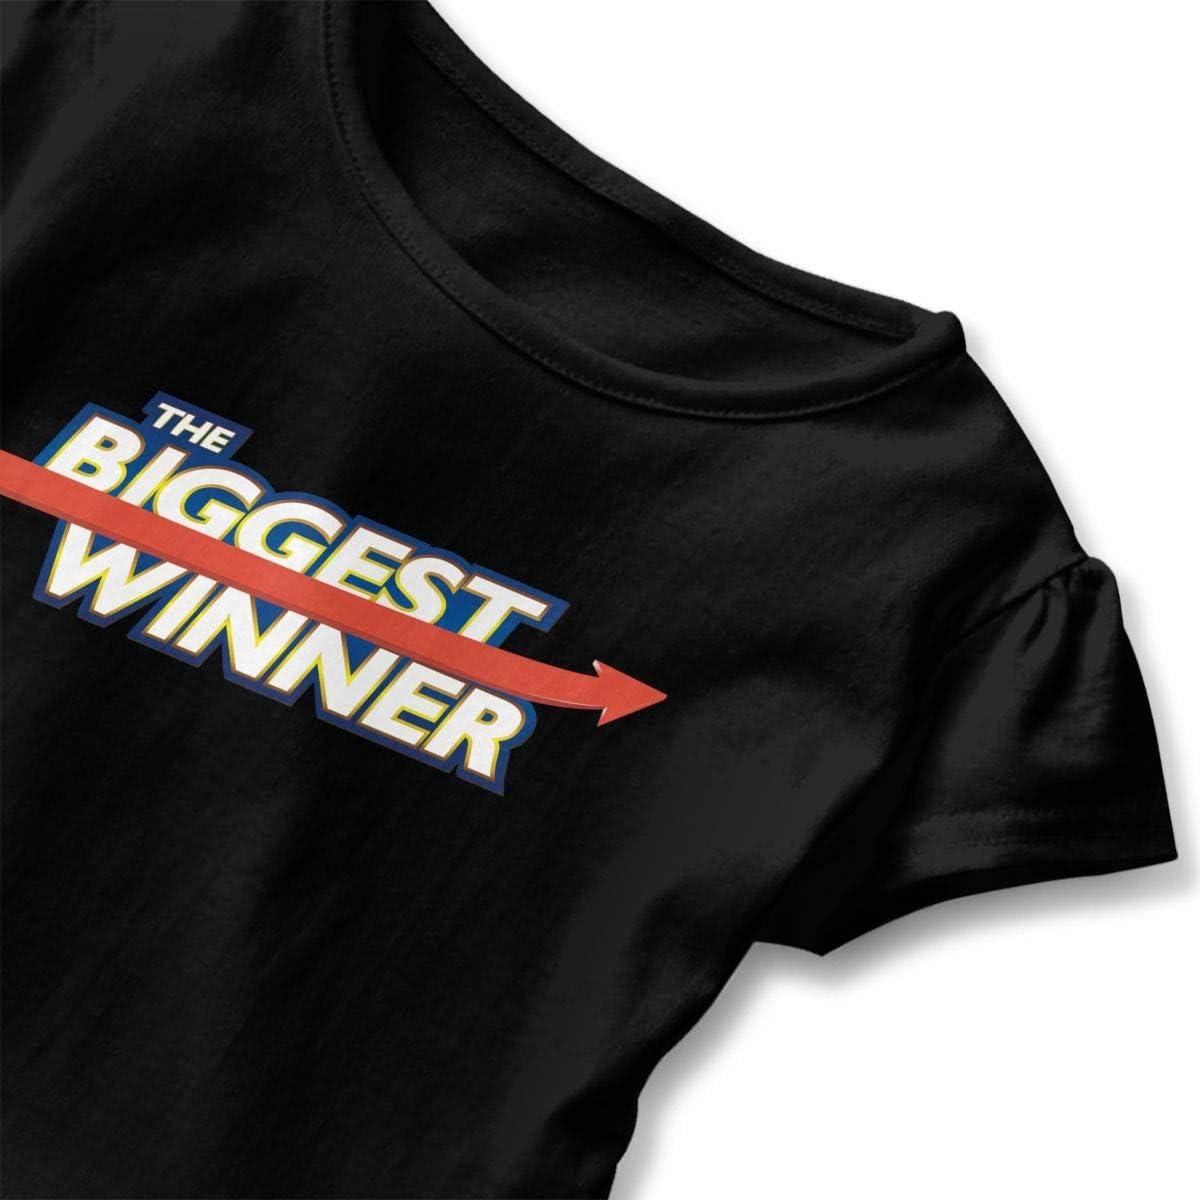 JVNSS Biggest-Winner Shirt Design Baby Girl Flounced T Shirts Graphic T-Shirt for 2-6T Kids Girls